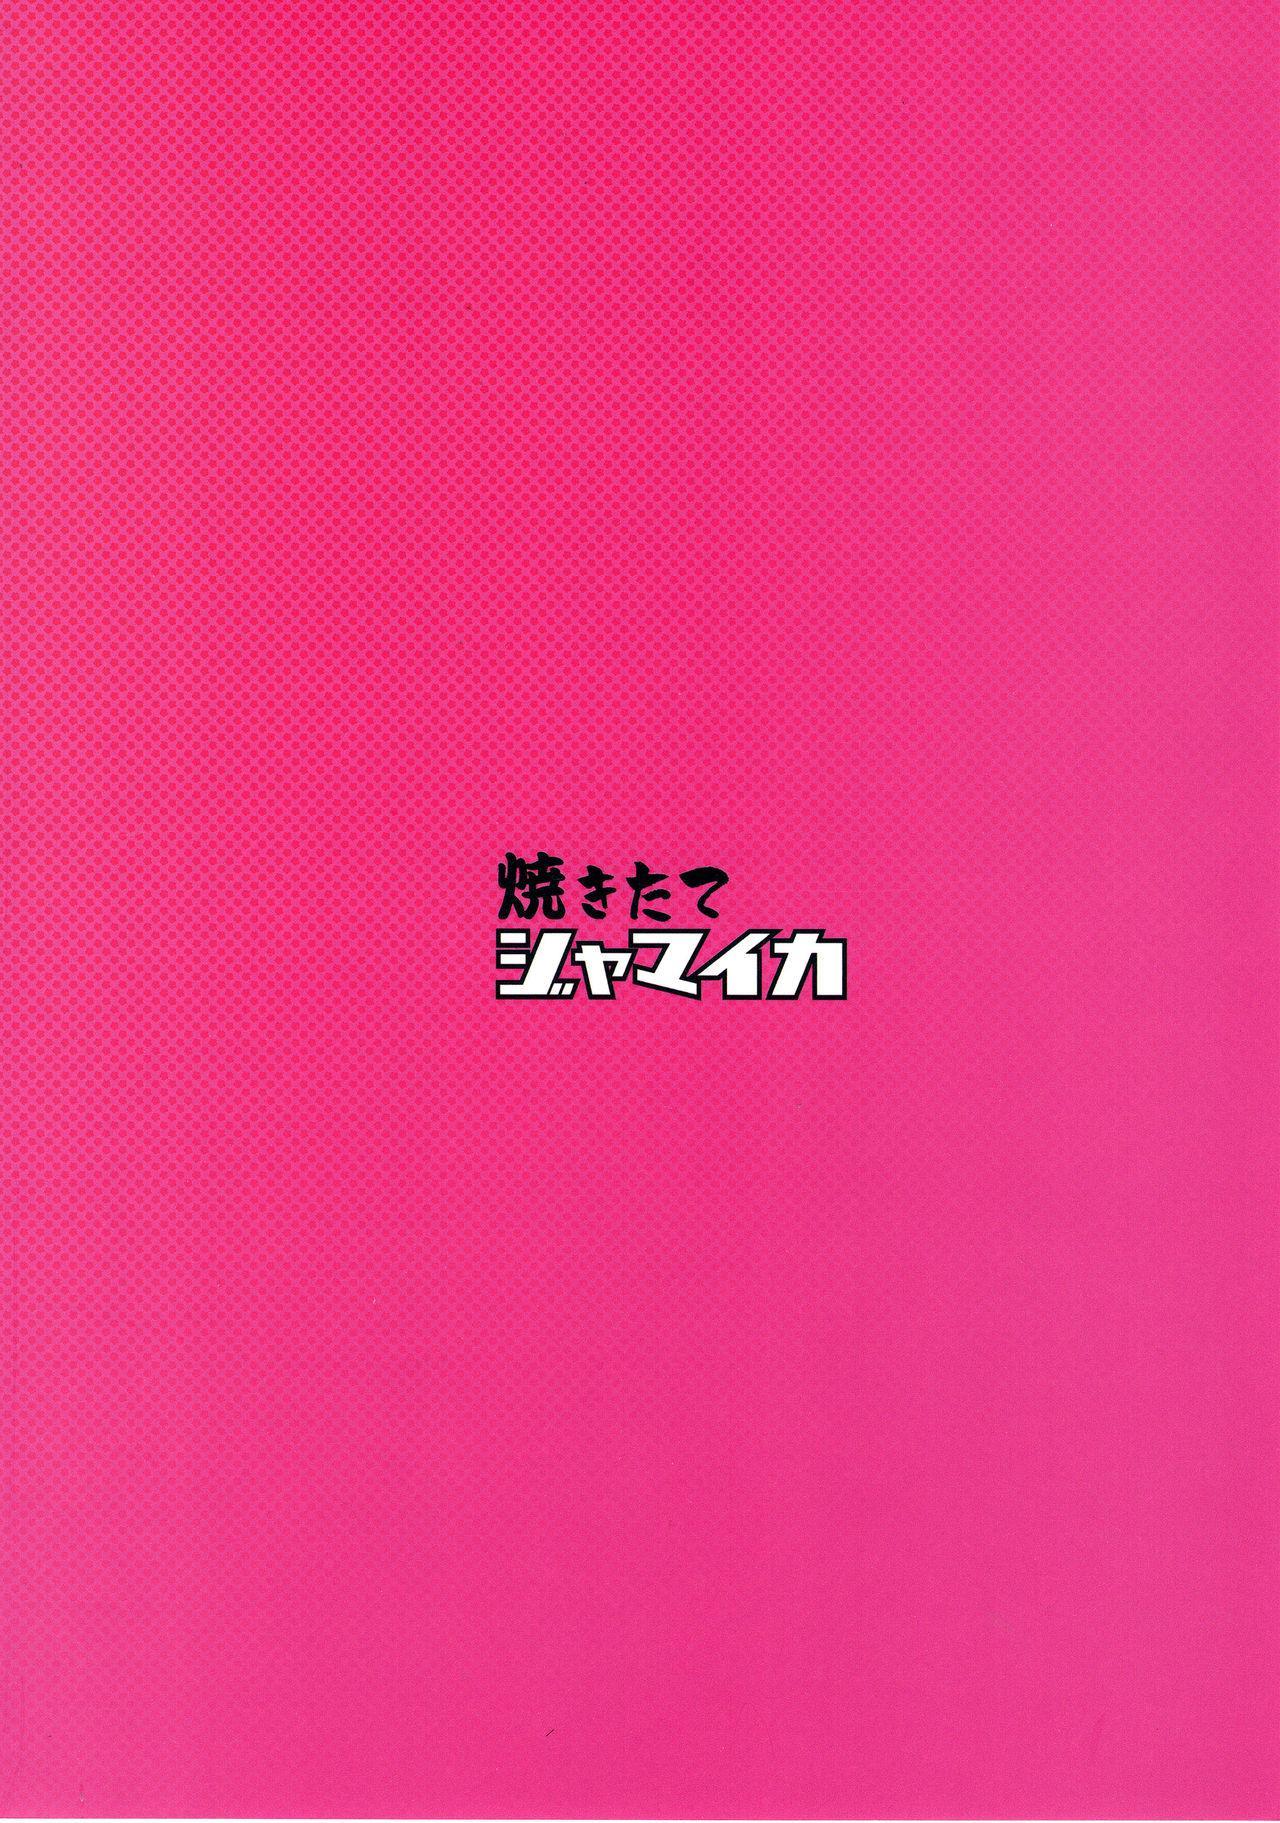 Chinpo Yakuza Miporin 22